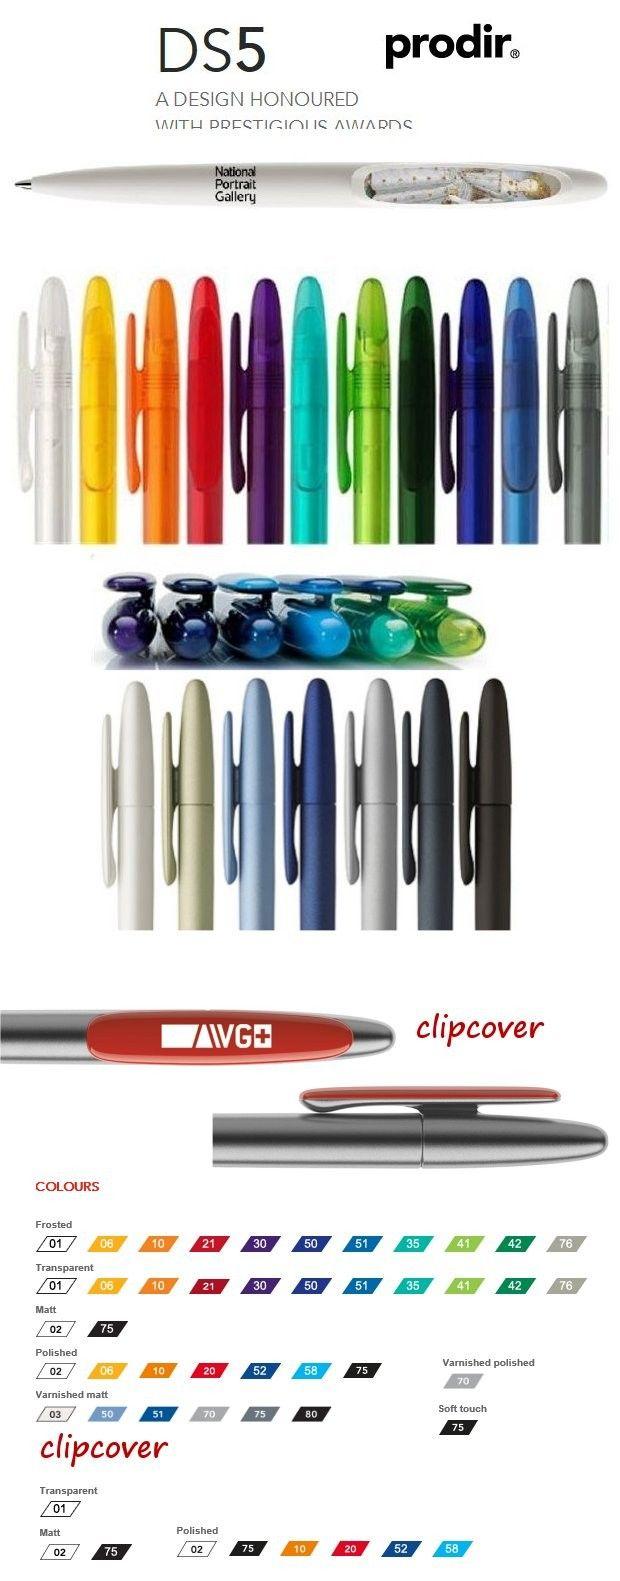 DS5 Prodir pennen, mooie Zwitsers design